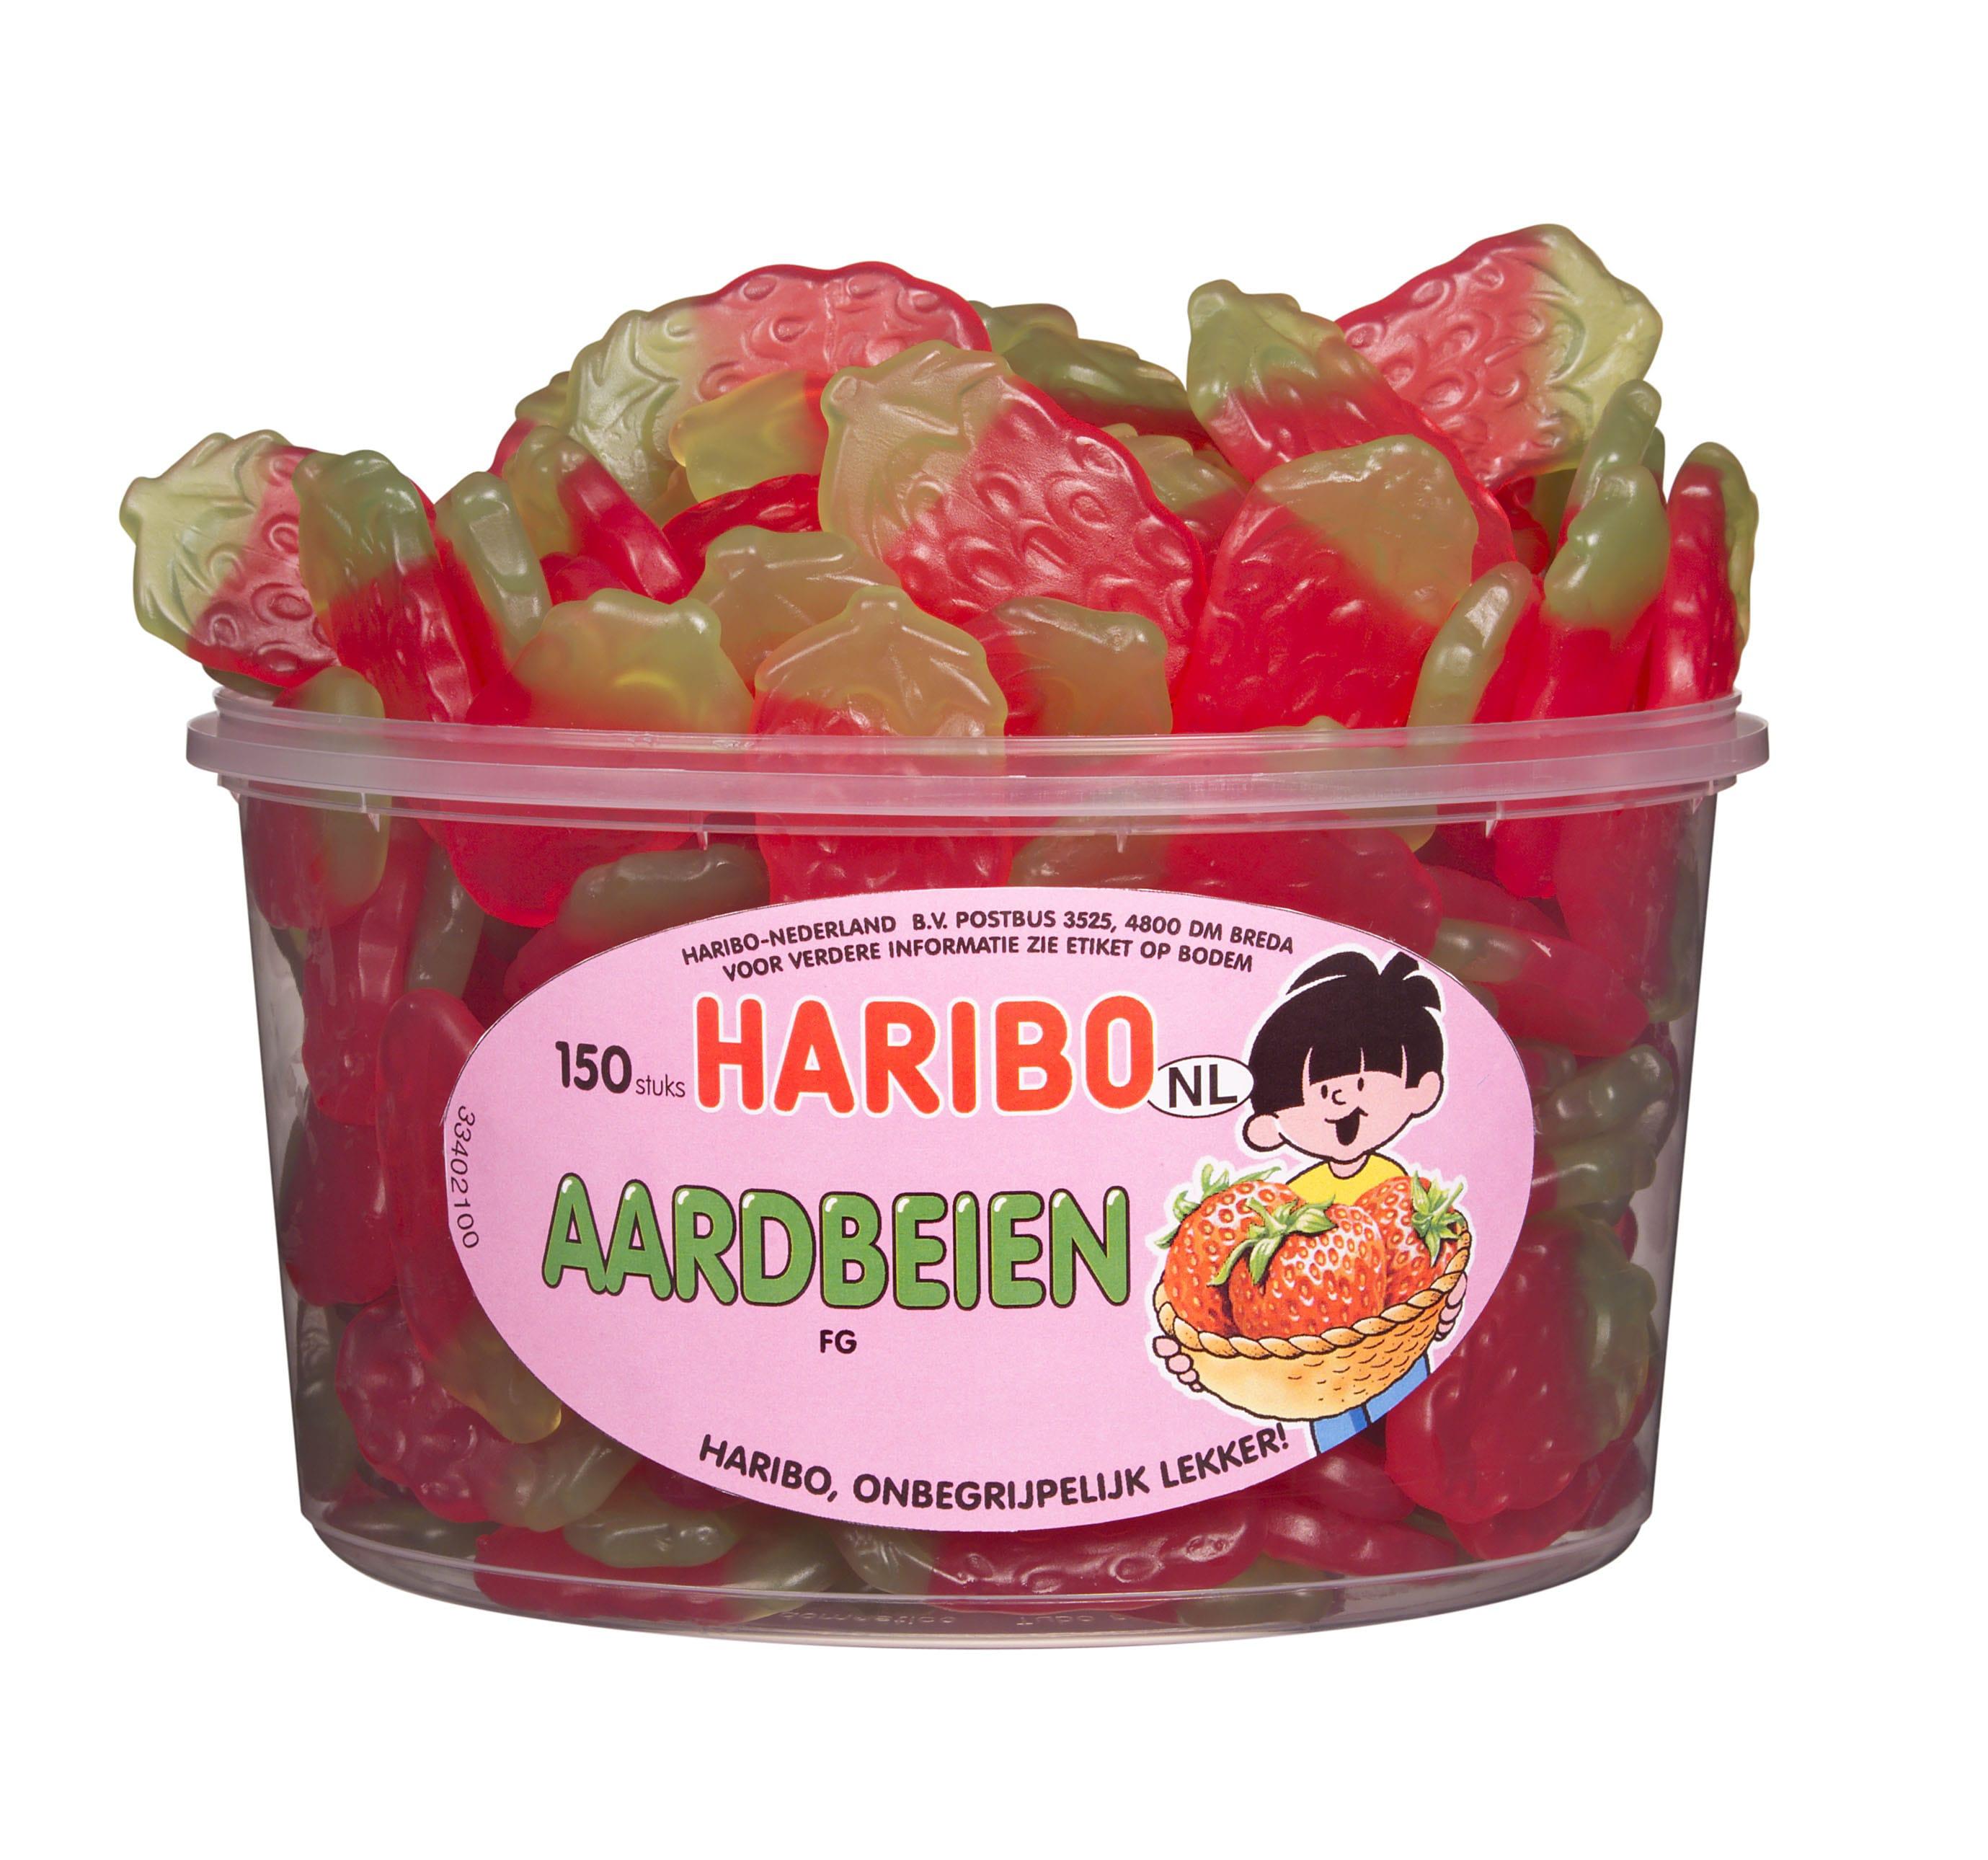 Haribo | Aardbeien | 150 stuks